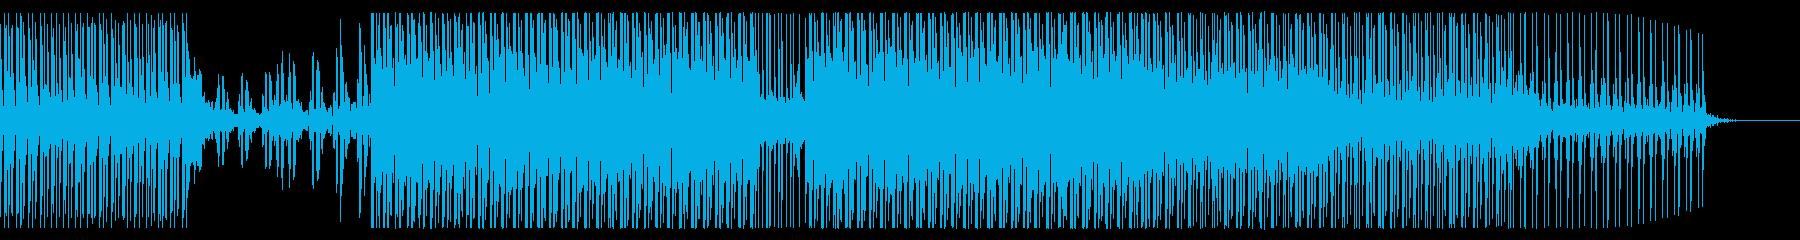 EDM/ハウス/夏っぽい爽やかさのポップの再生済みの波形